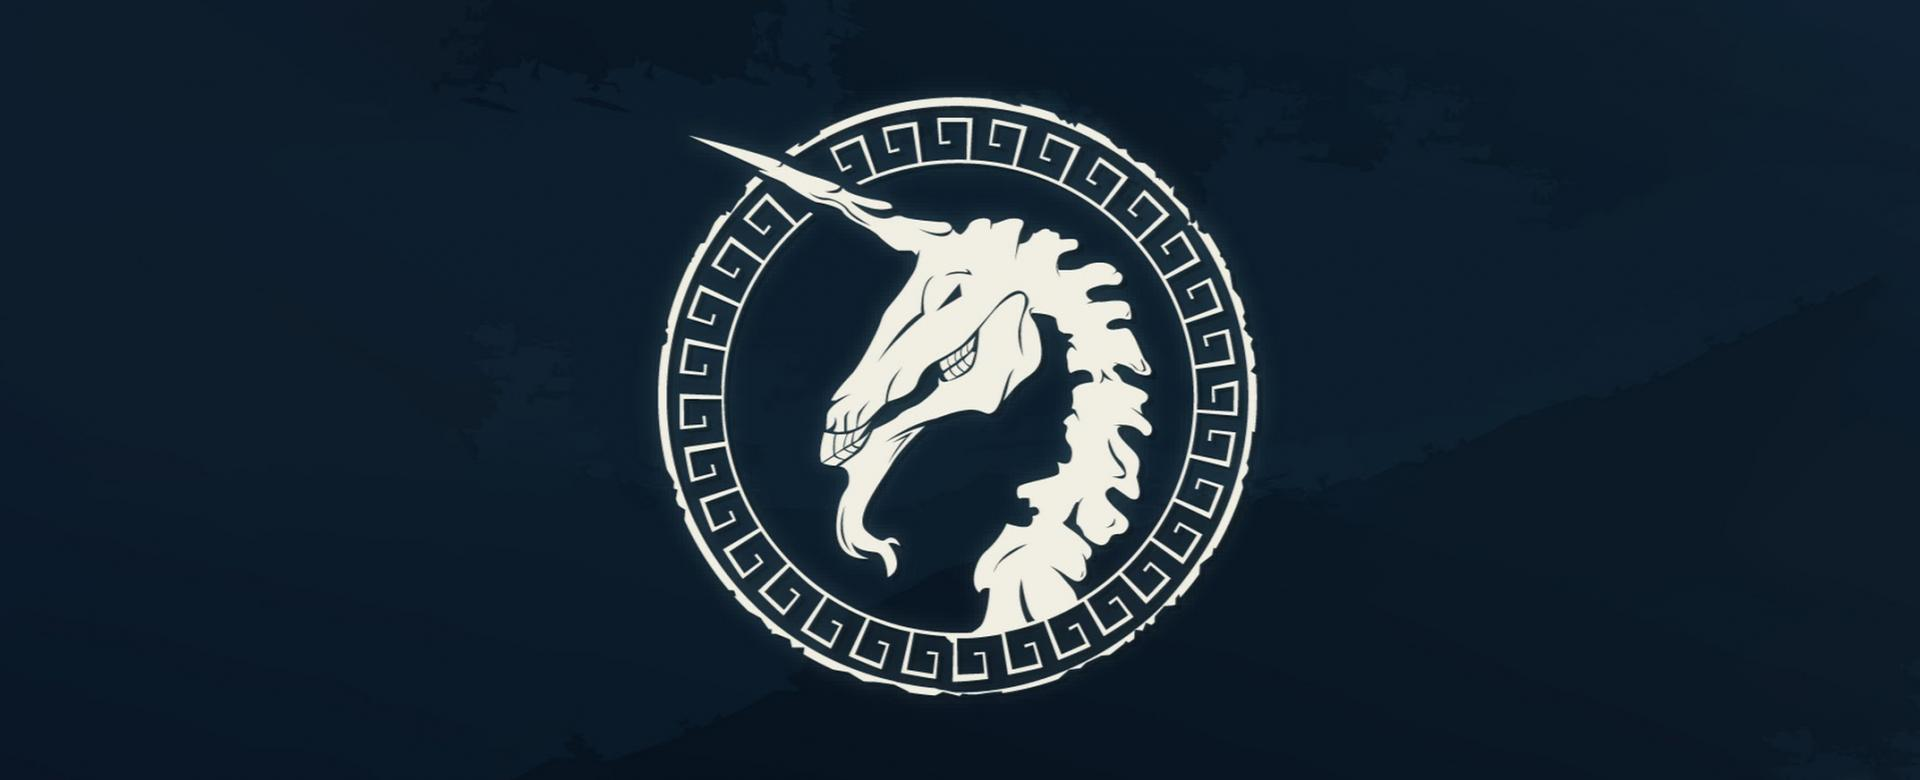 Trojan Horse was a Unicorn 2018